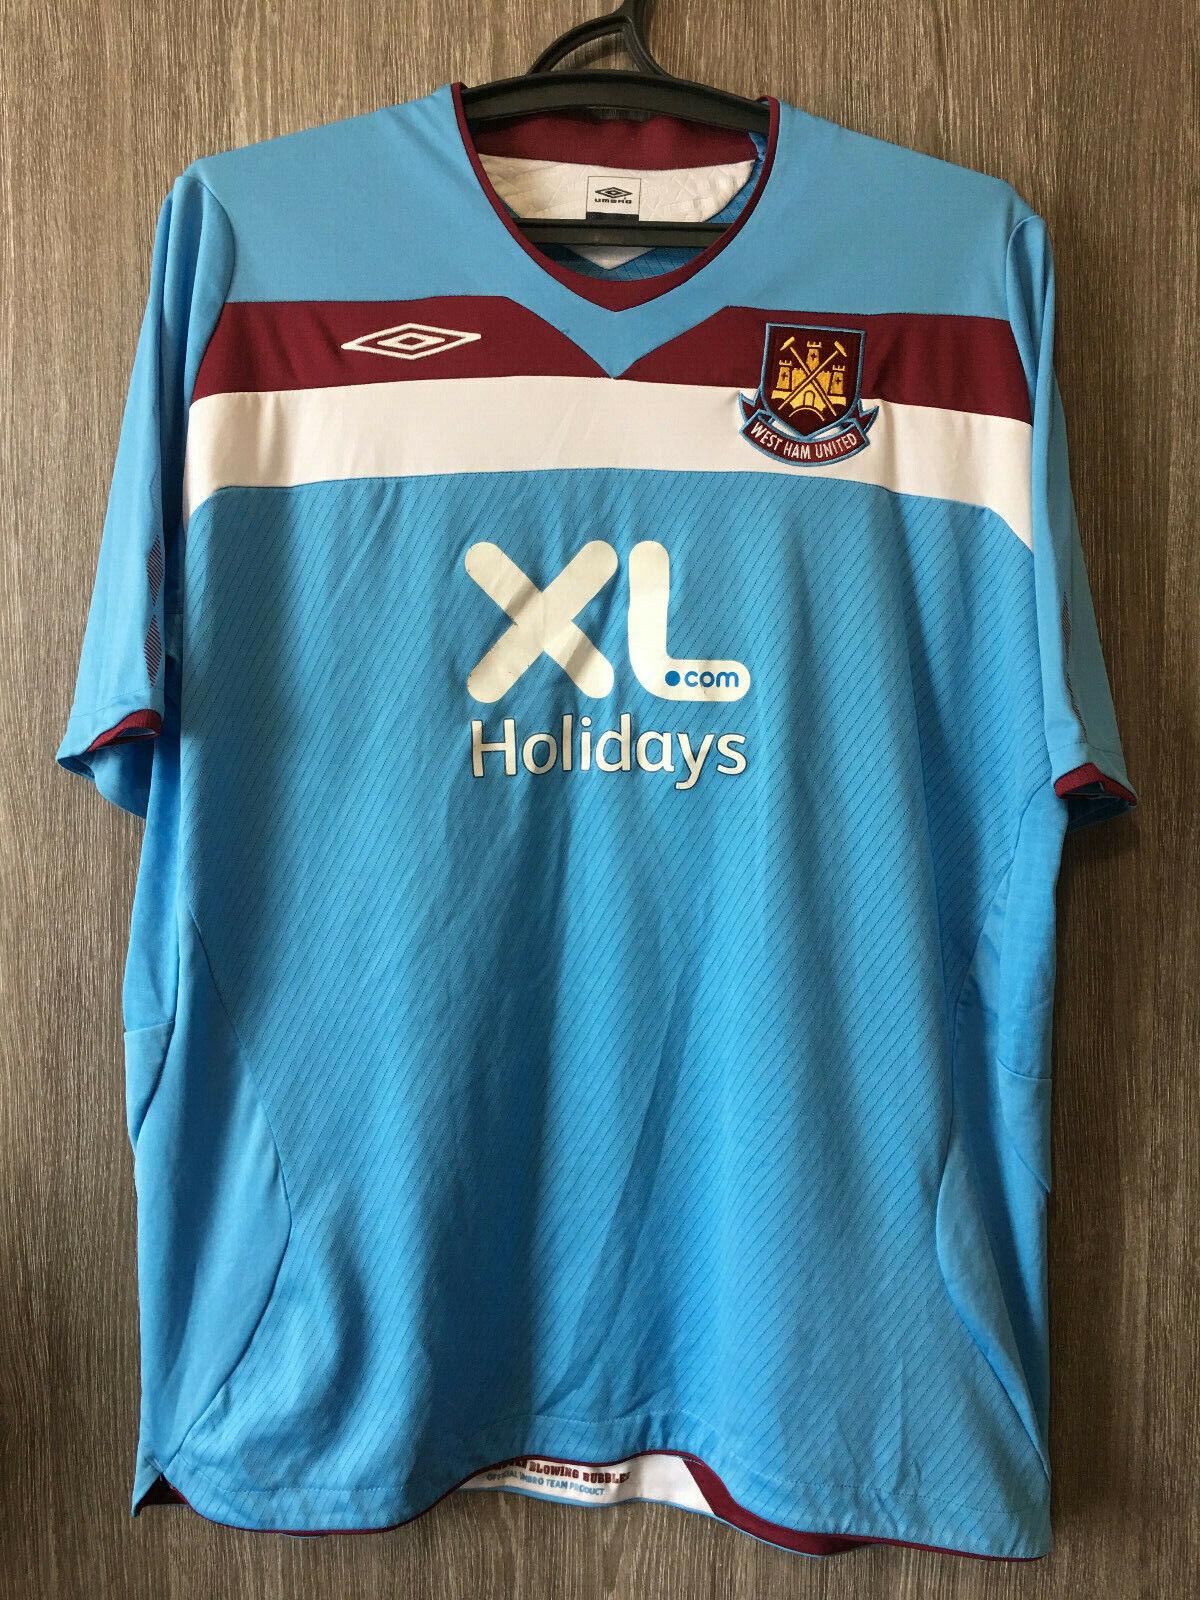 West Ham United Football Home Jersey Shirt Tee Top 2018 19 Womens Umbro